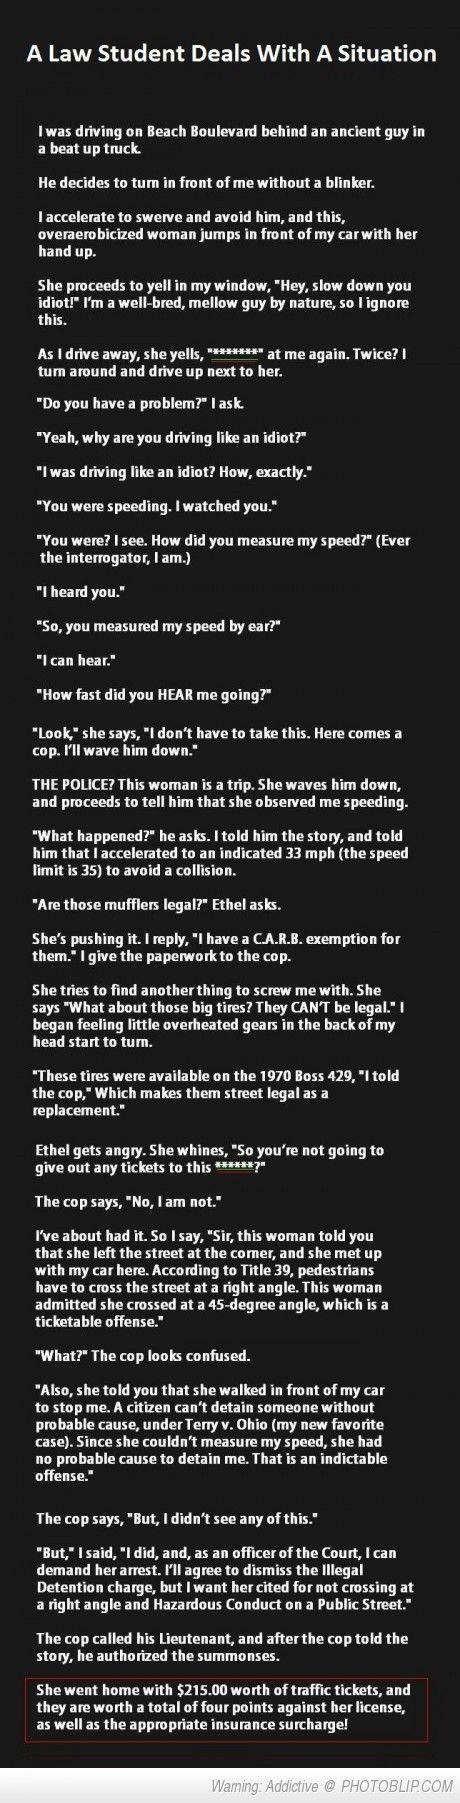 #something #student #genius #woman #tries #mess